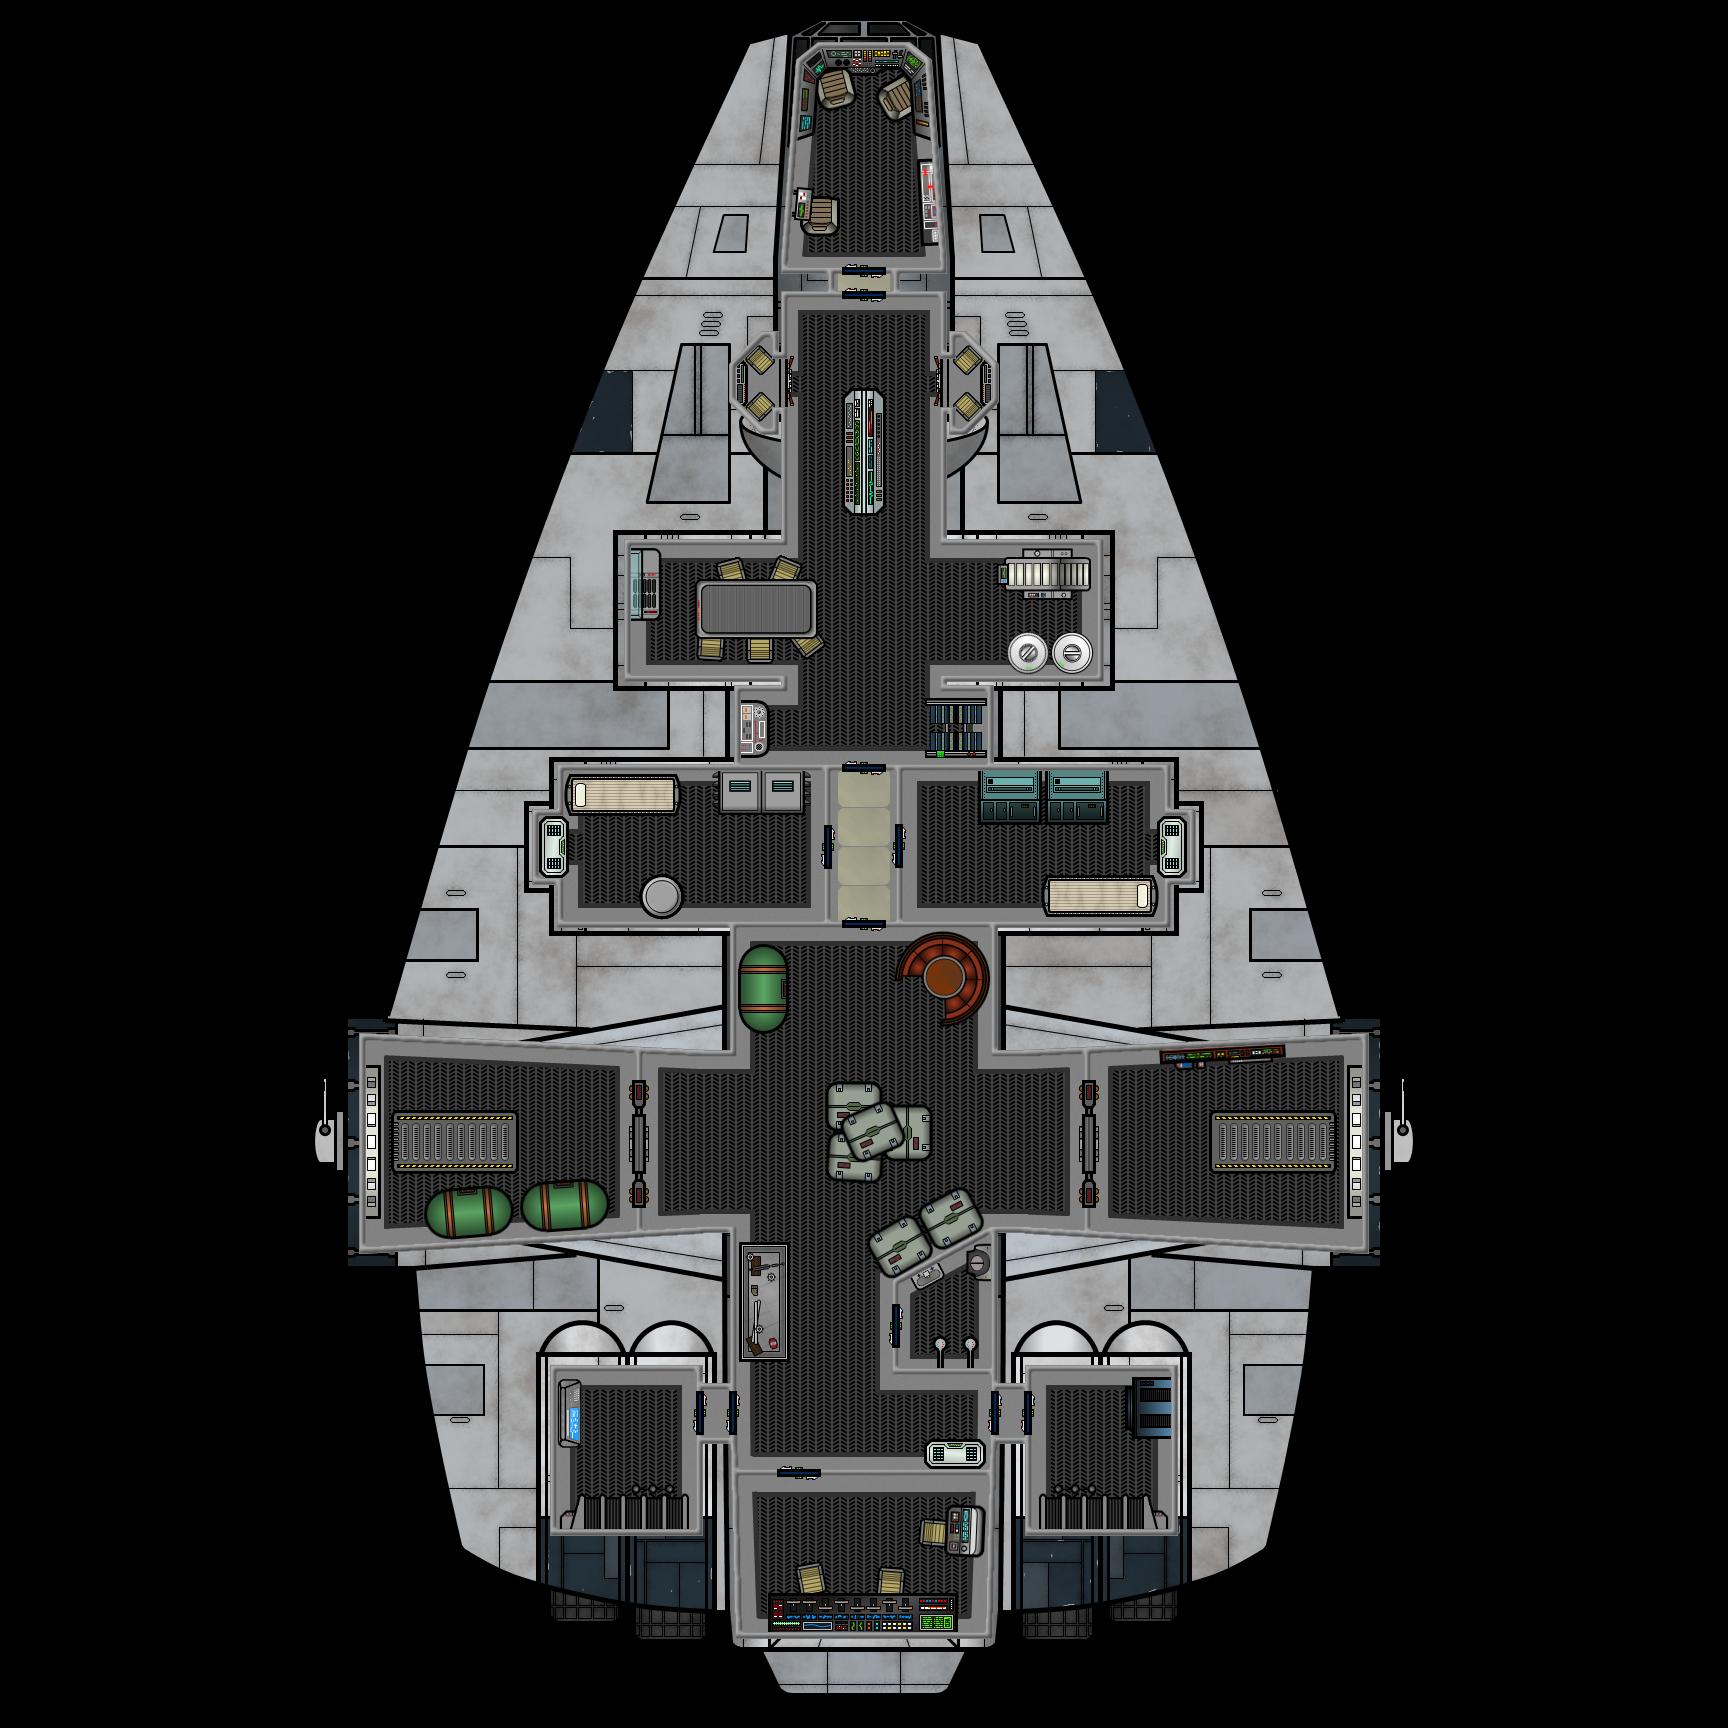 Barloz-class Medium Freighter (Deck Plan)   Star Wars in